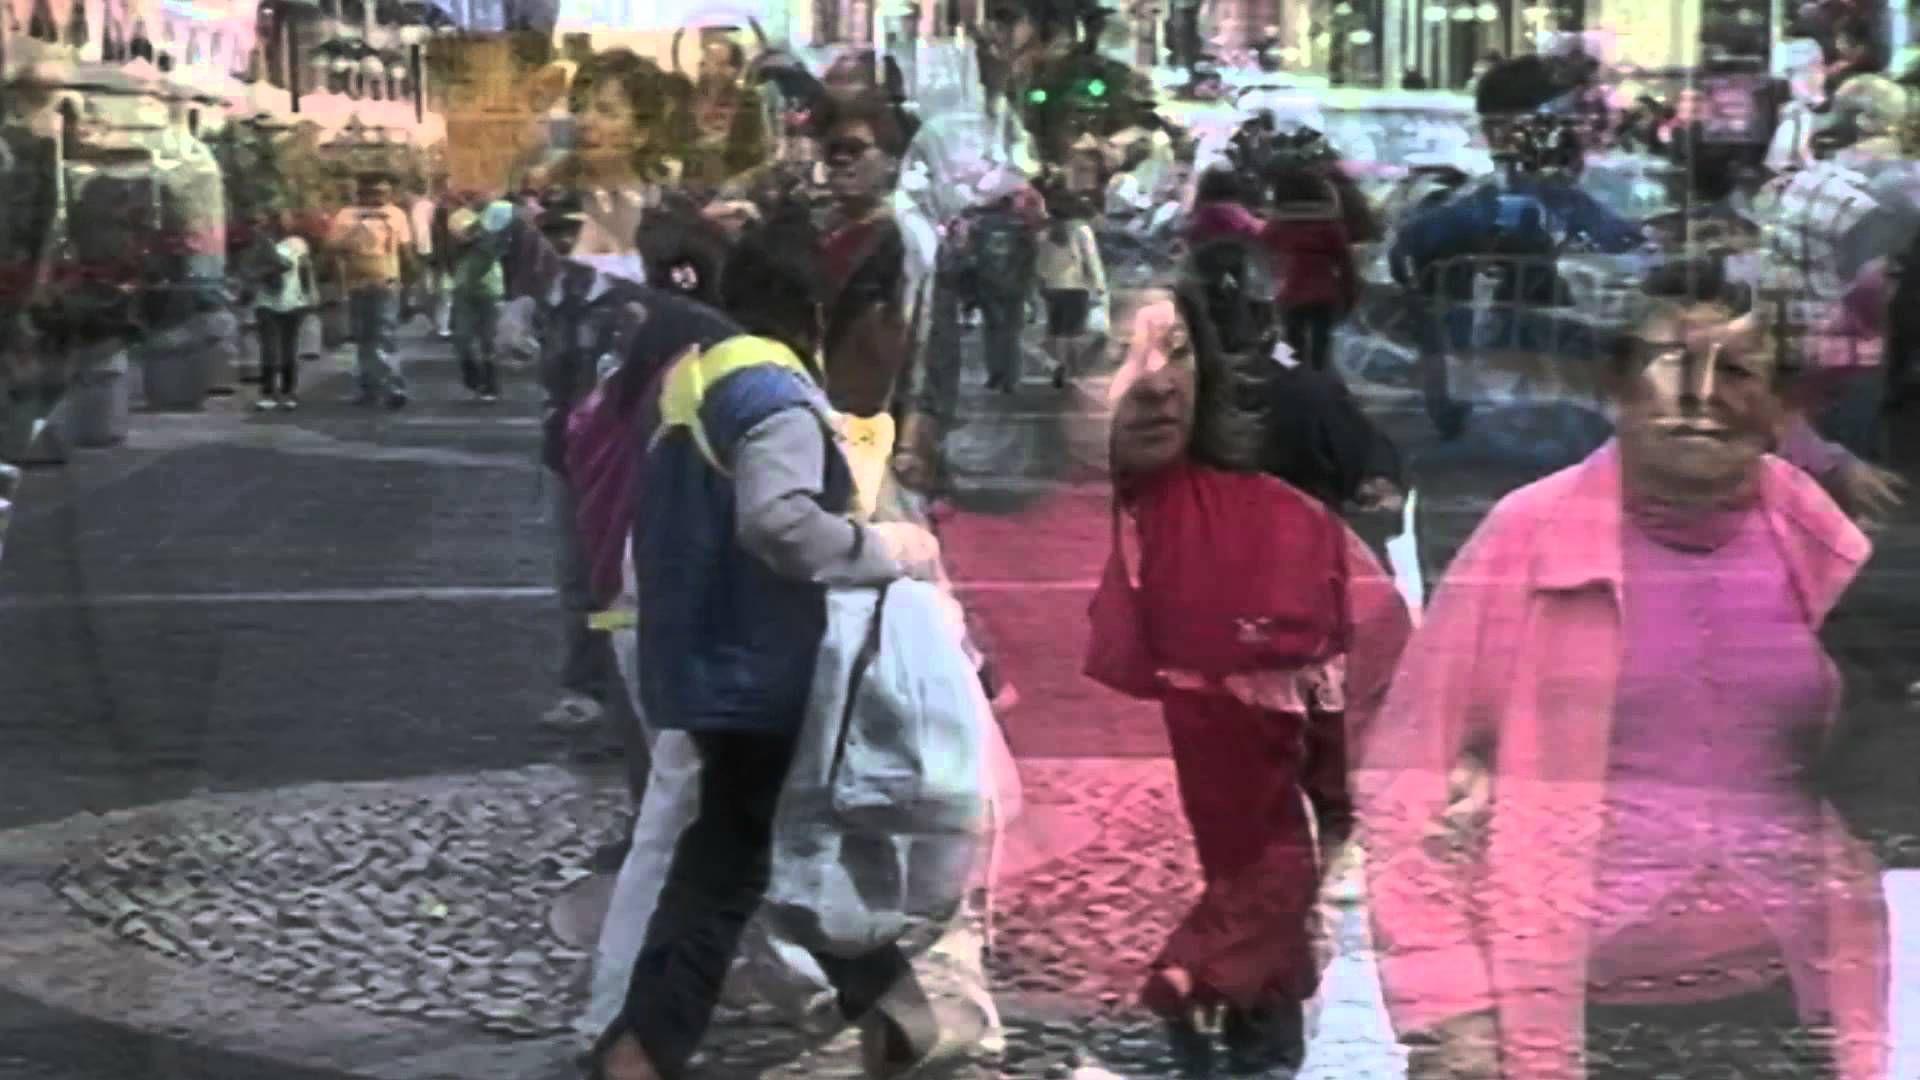 CUSAS QUE ORIGINAN LA COLITIS NERVIOSA